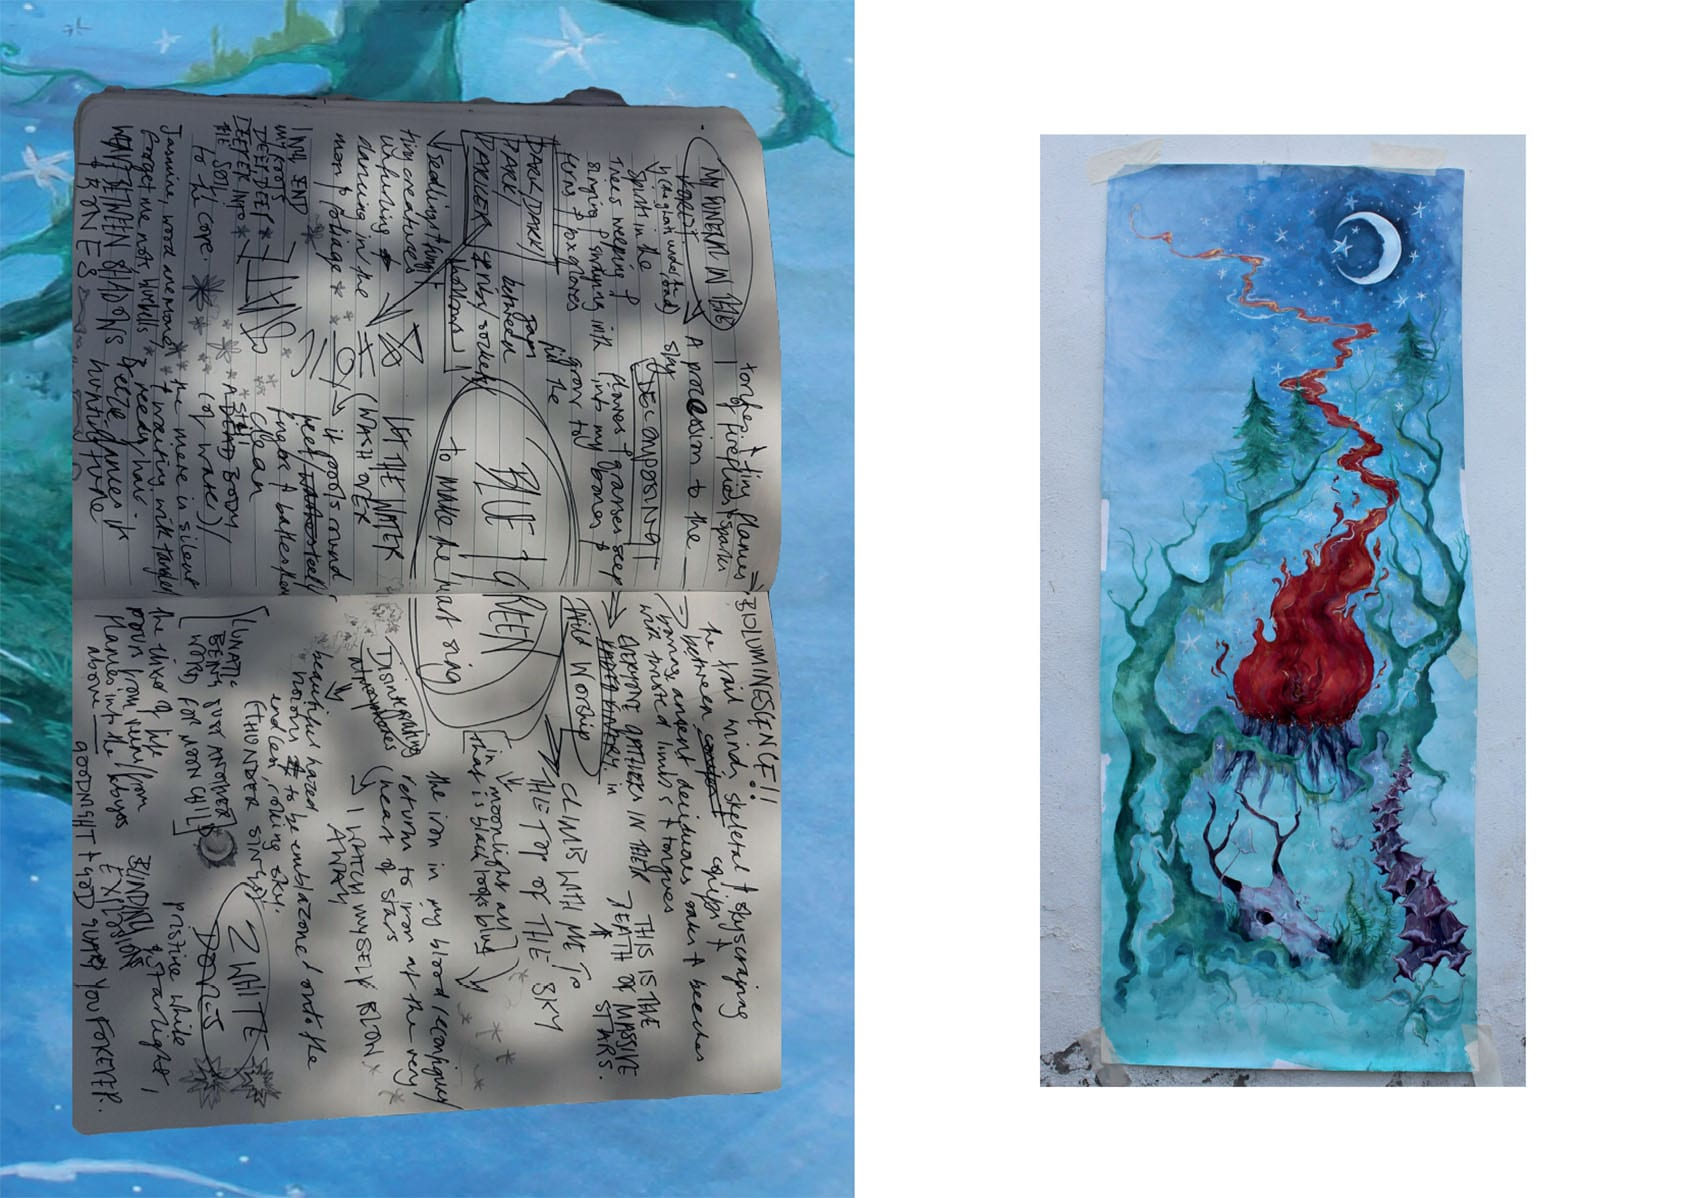 artwork by natasha watson, painting and mindmap